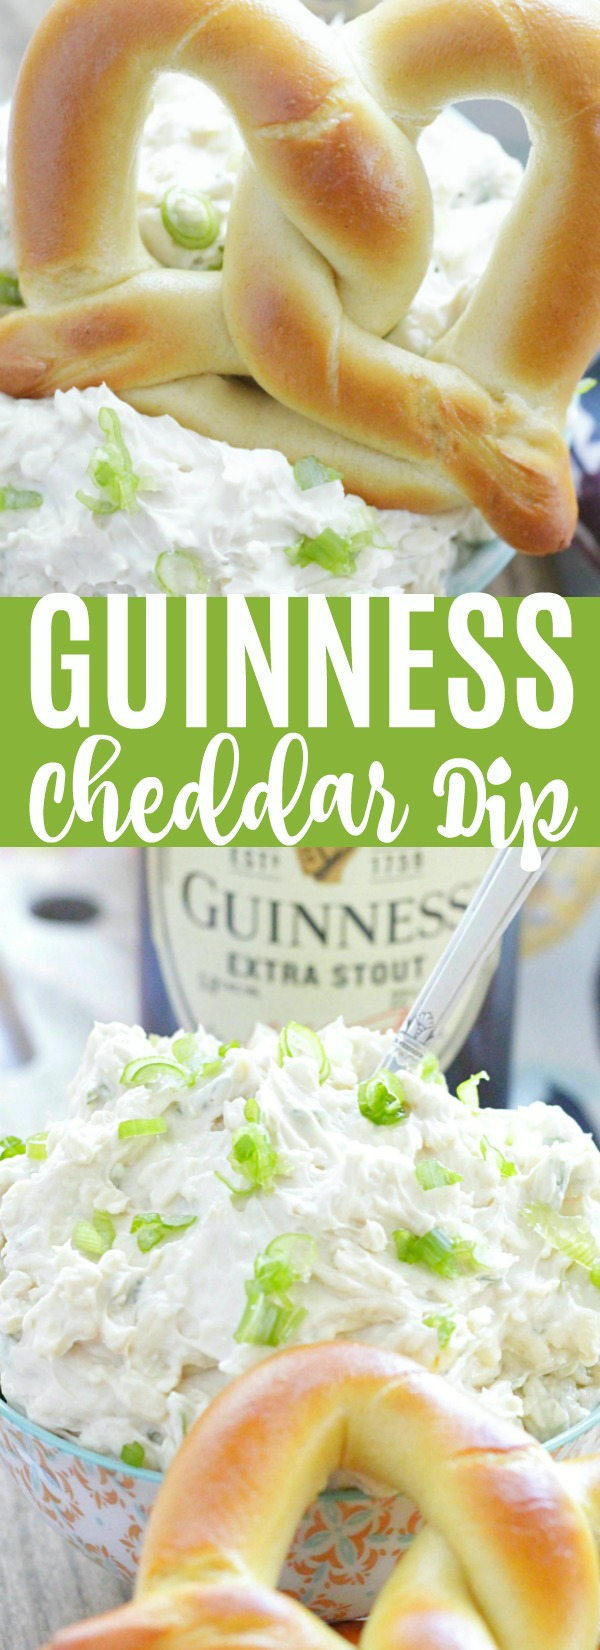 Guinness Cheddar Dip | Foodtastic Mom #guinnessrecipes #cheesedip #guinnesscheddardip via @foodtasticmom